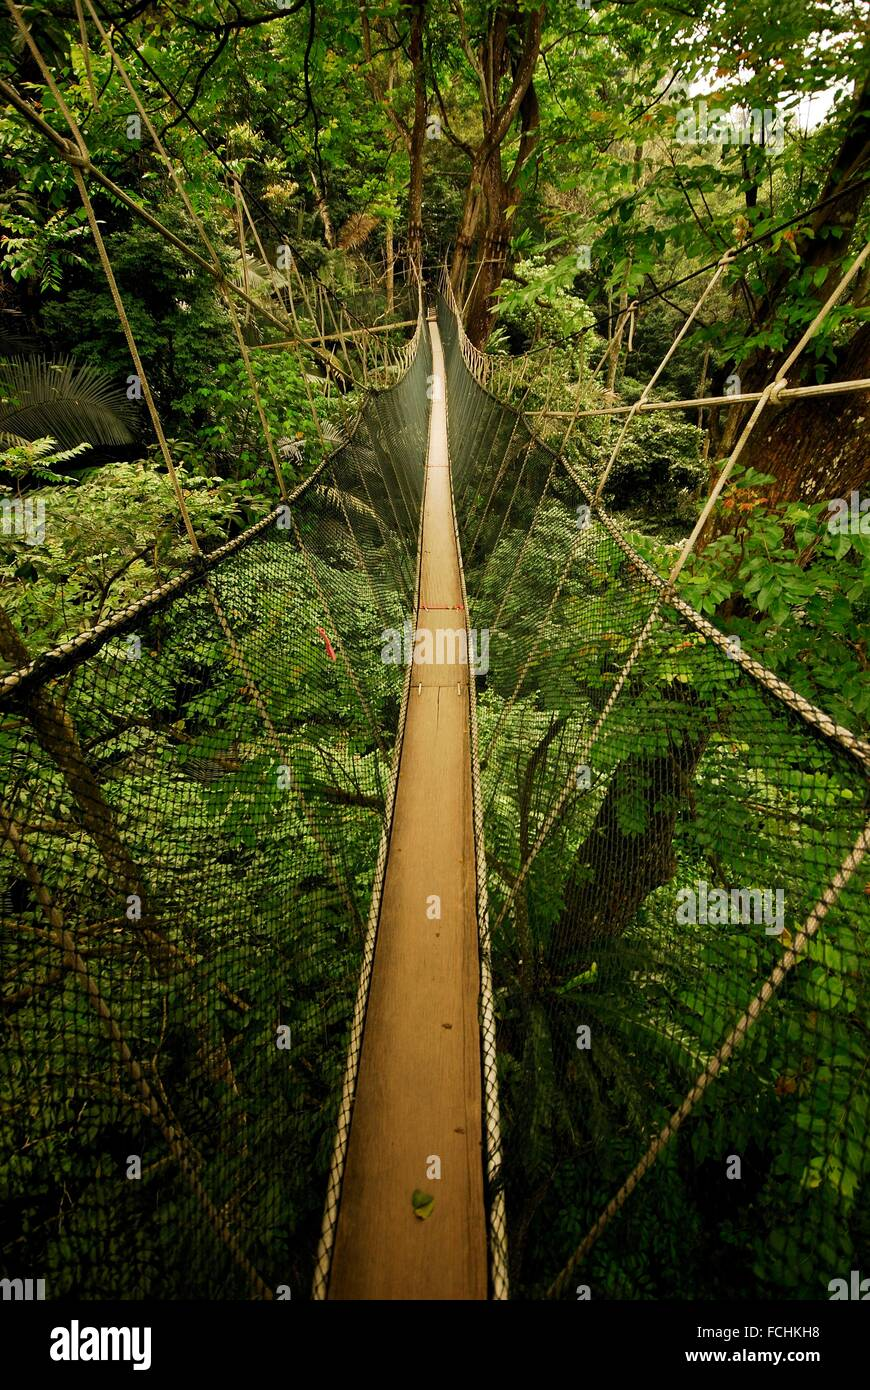 Canopy walk in a rainforest of FRIM in Kepong near Kuala Lumpur Selangor Malaysia & Canopy walk in a rainforest of FRIM in Kepong near Kuala Lumpur ...